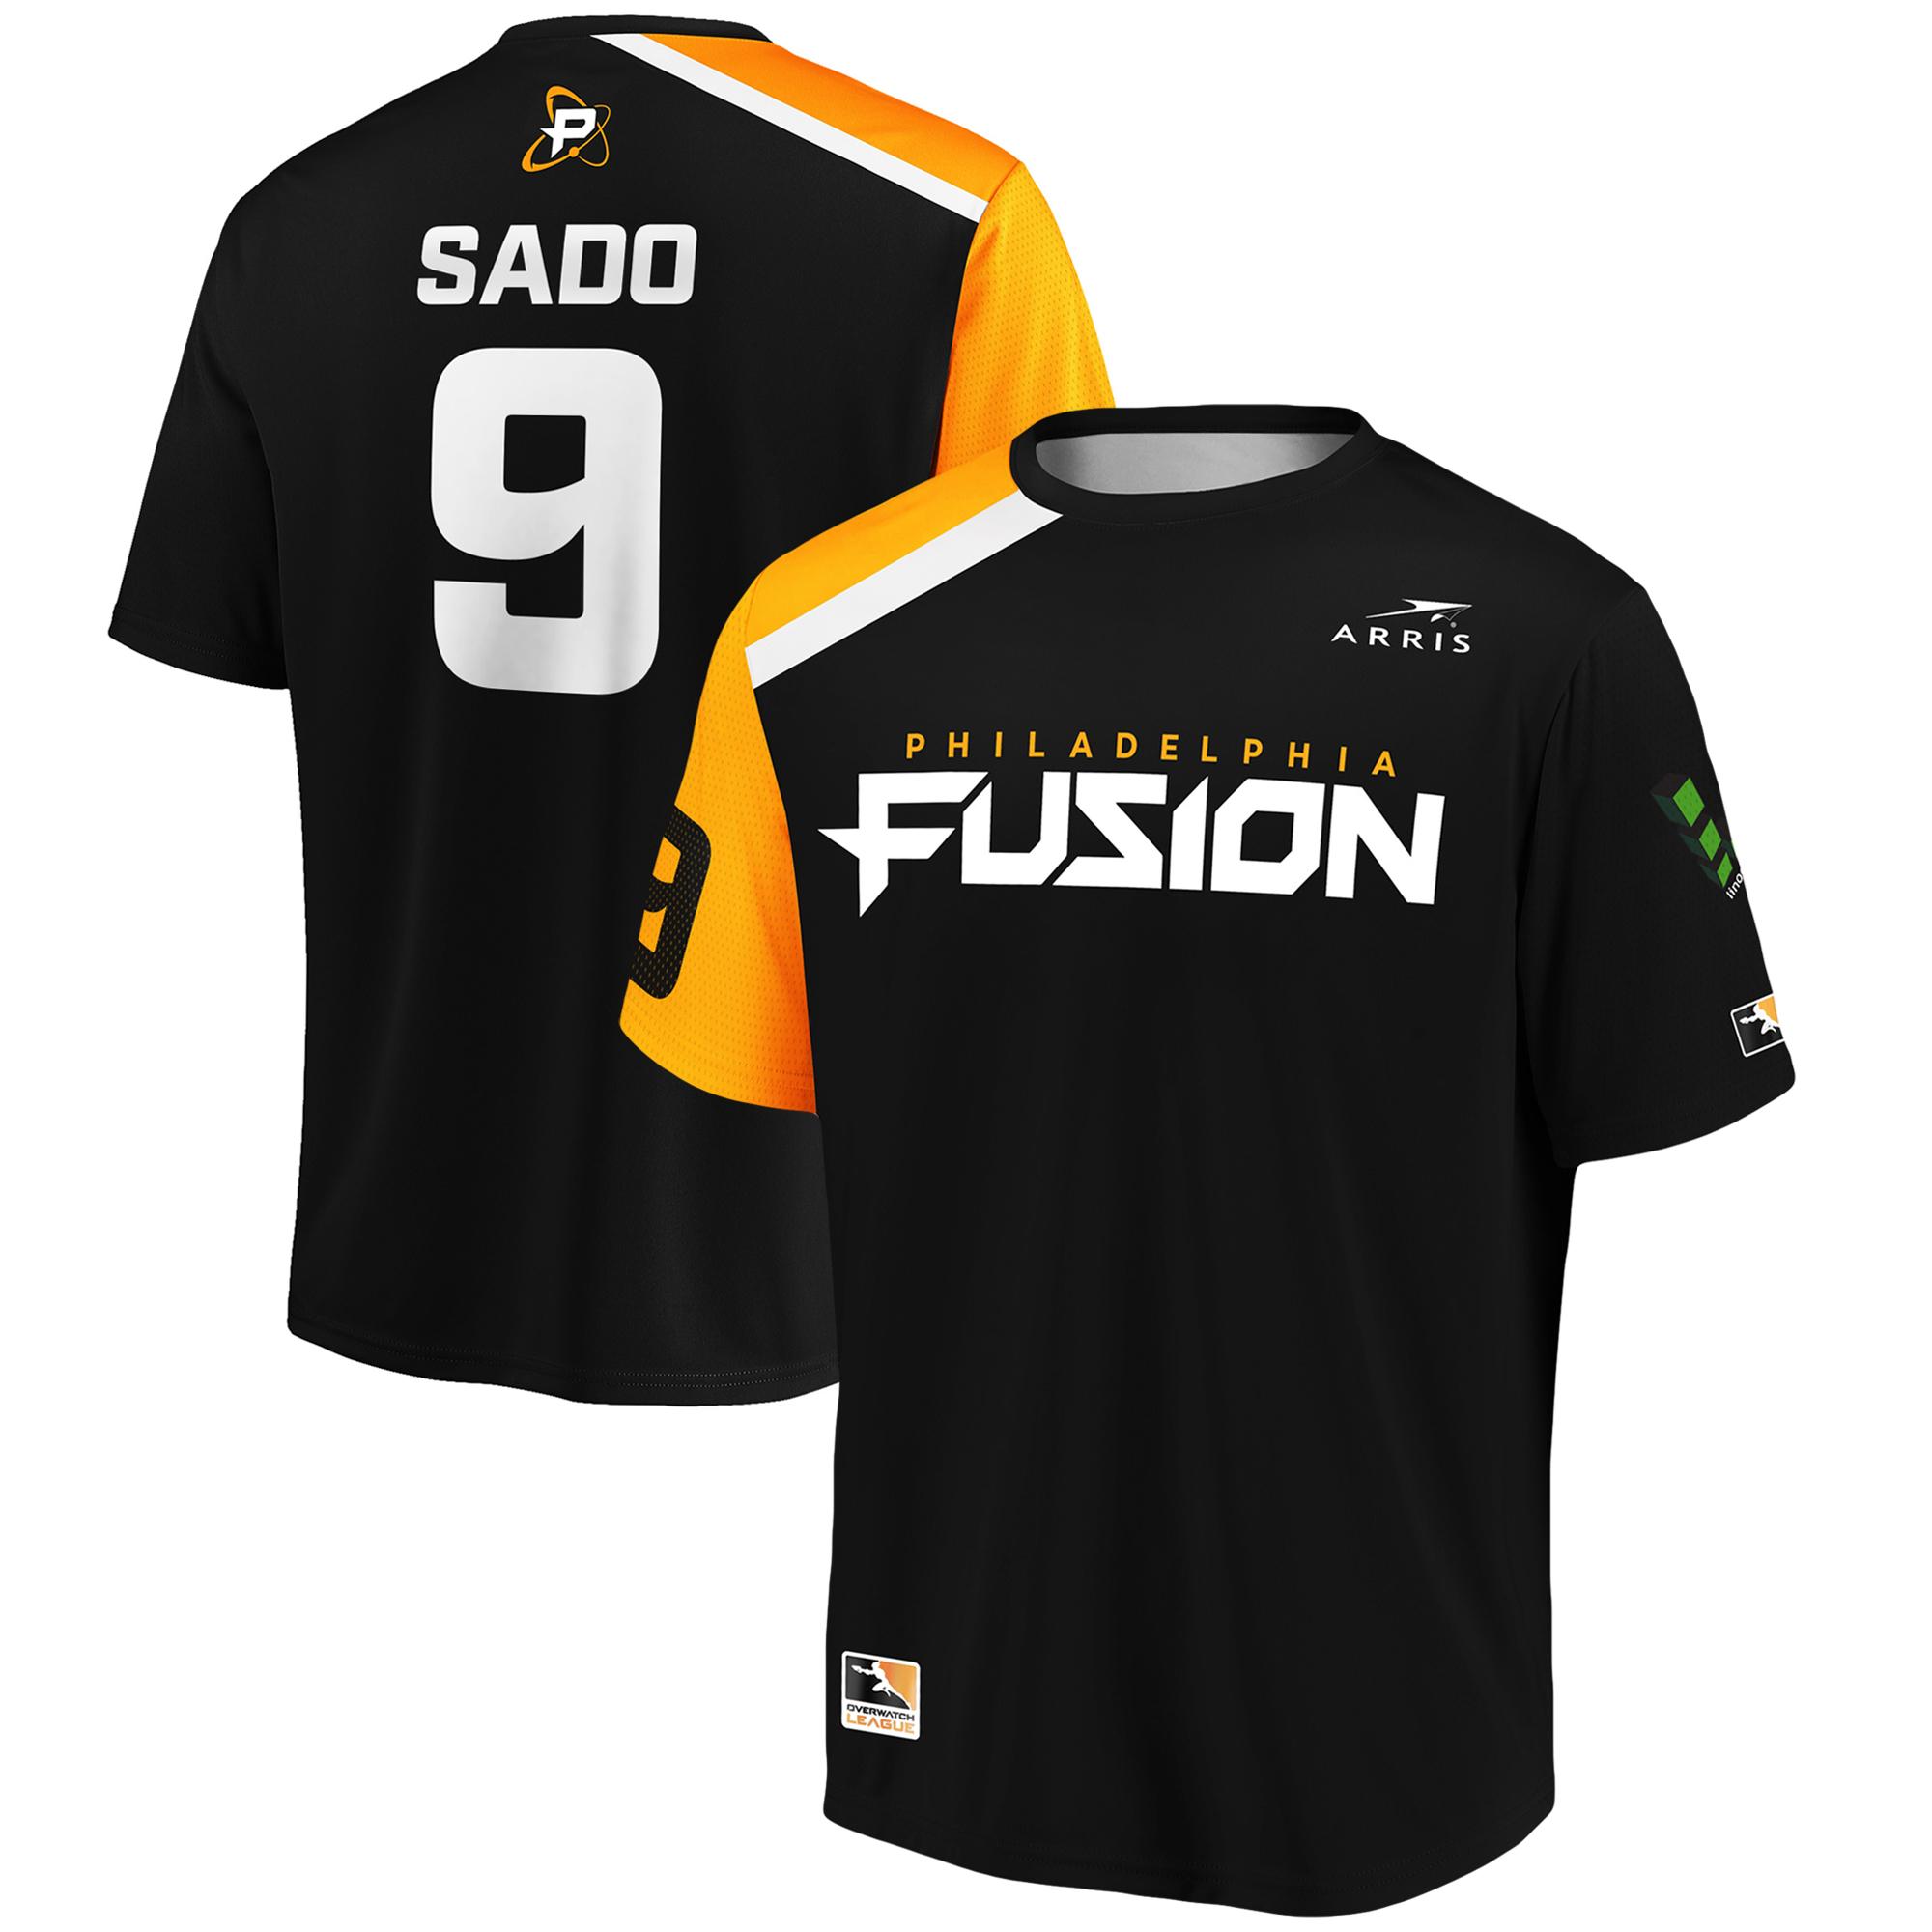 Sado Philadelphia Fusion Overwatch League Replica Home Jersey - Black